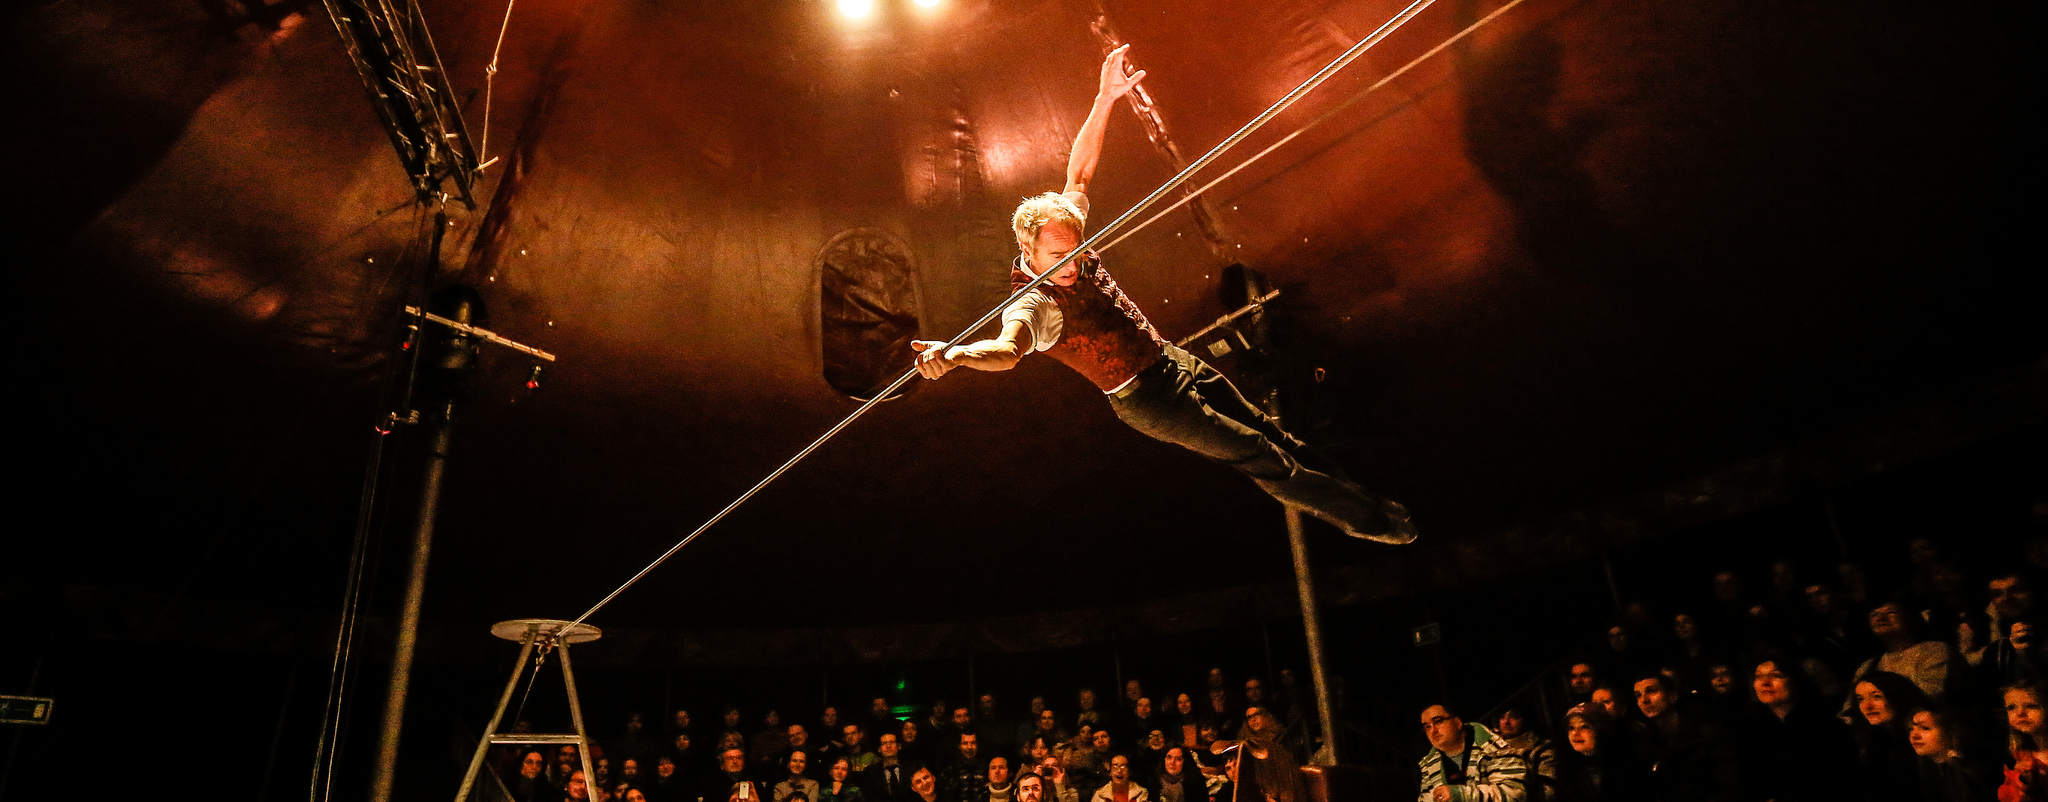 L'homme cirque